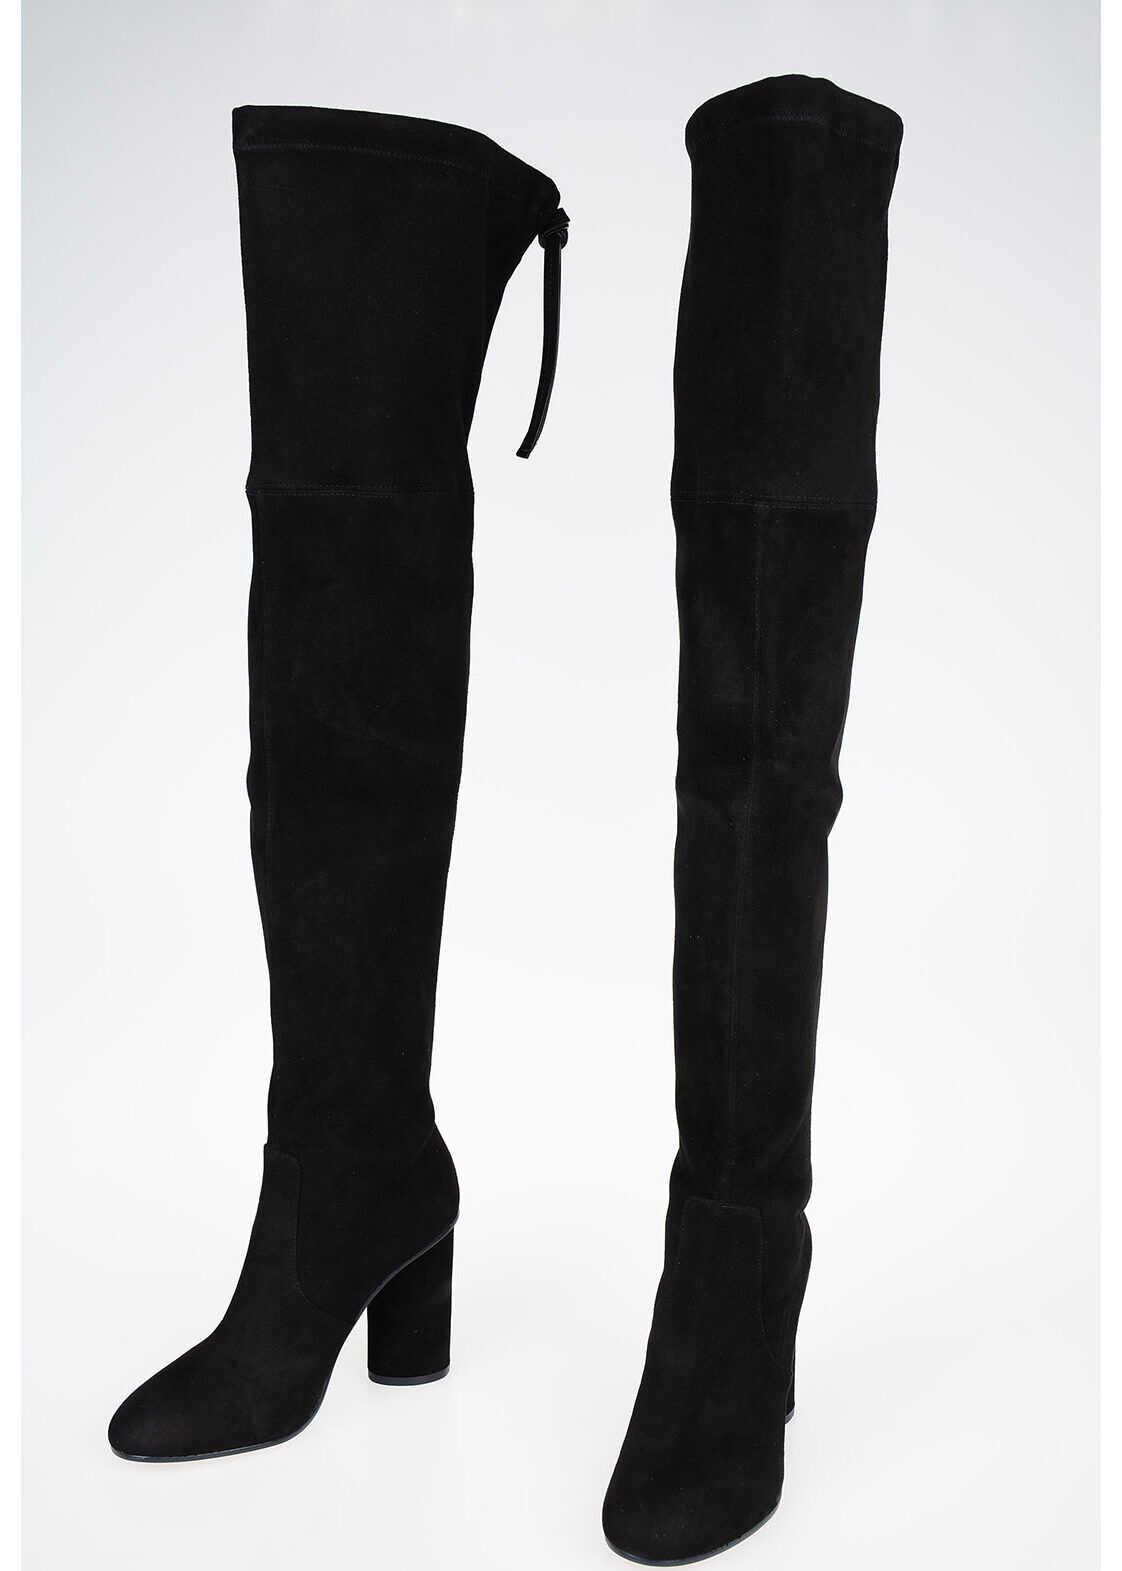 Stuart Weitzman 6cm Suede Leather HELENA 95 Boots BLACK